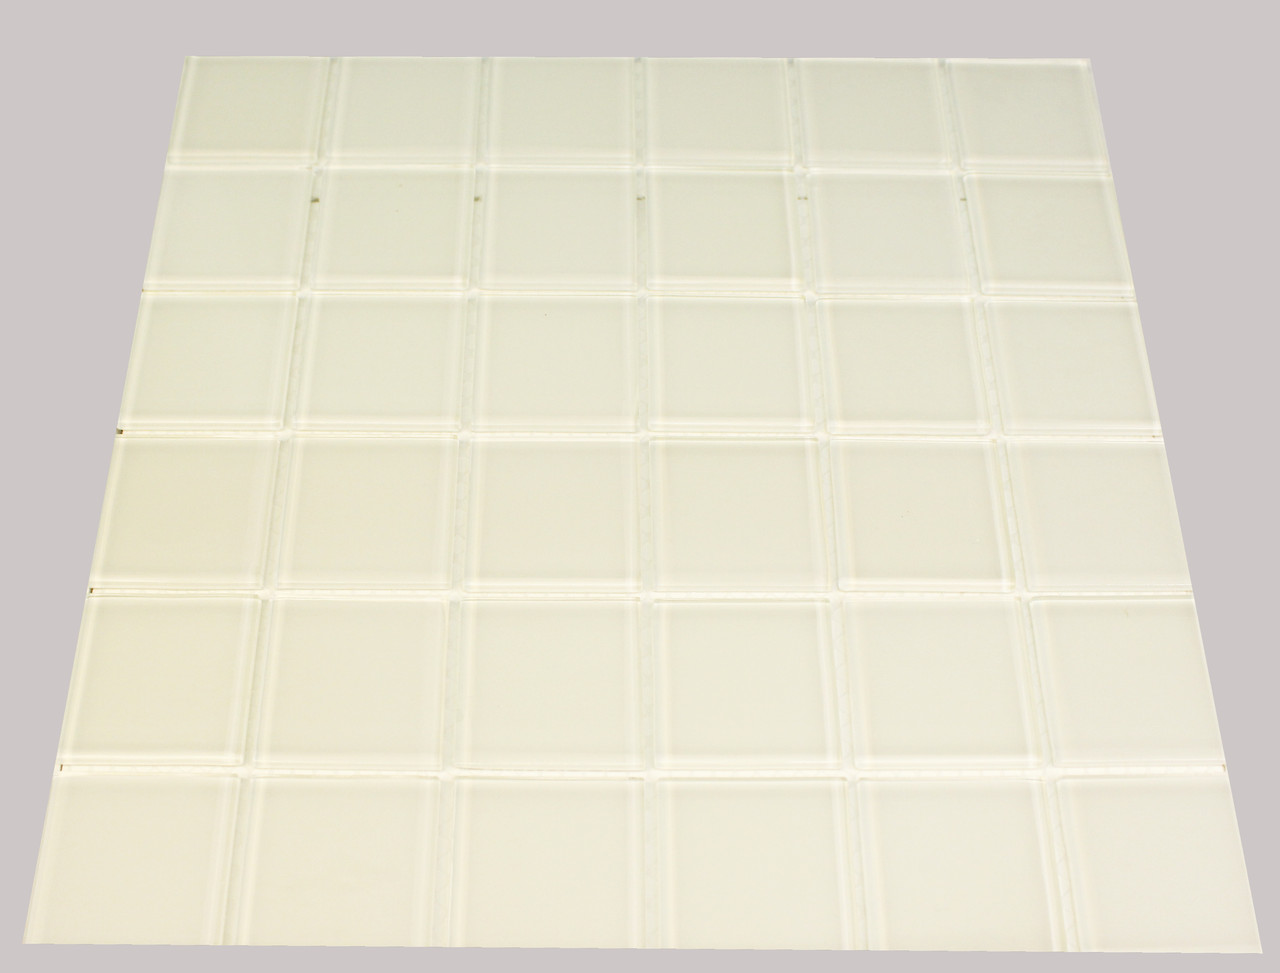 Крупная стеклянная мозаика белый квадрат